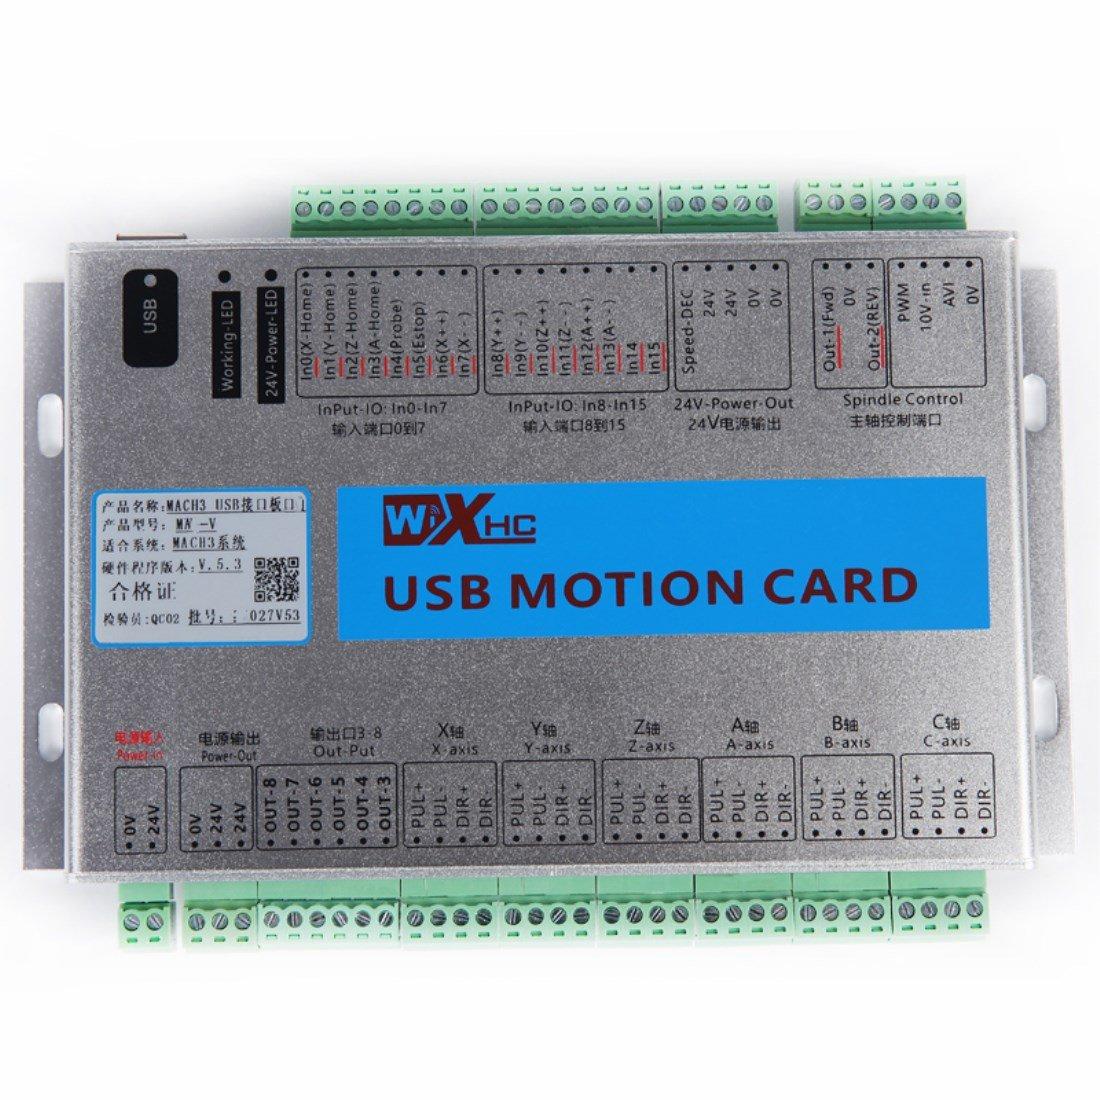 Kehuashina Mach3 4Axis Breakout Board CNC USB Motion Control Card 2MHz MK4-V Upgrade